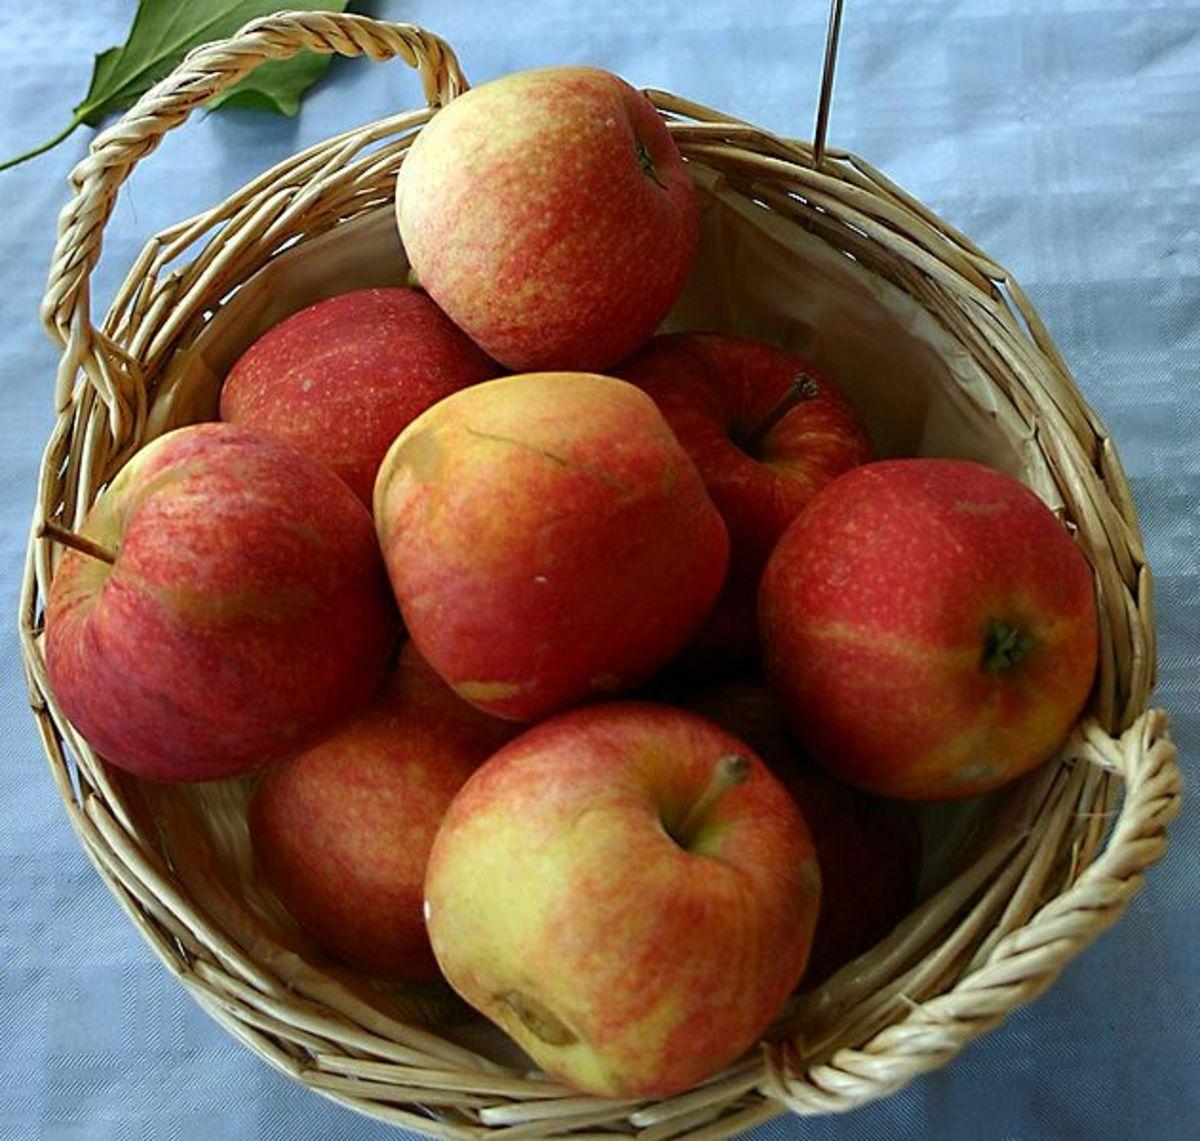 Gala Apples  Photo by: Sven Teschke